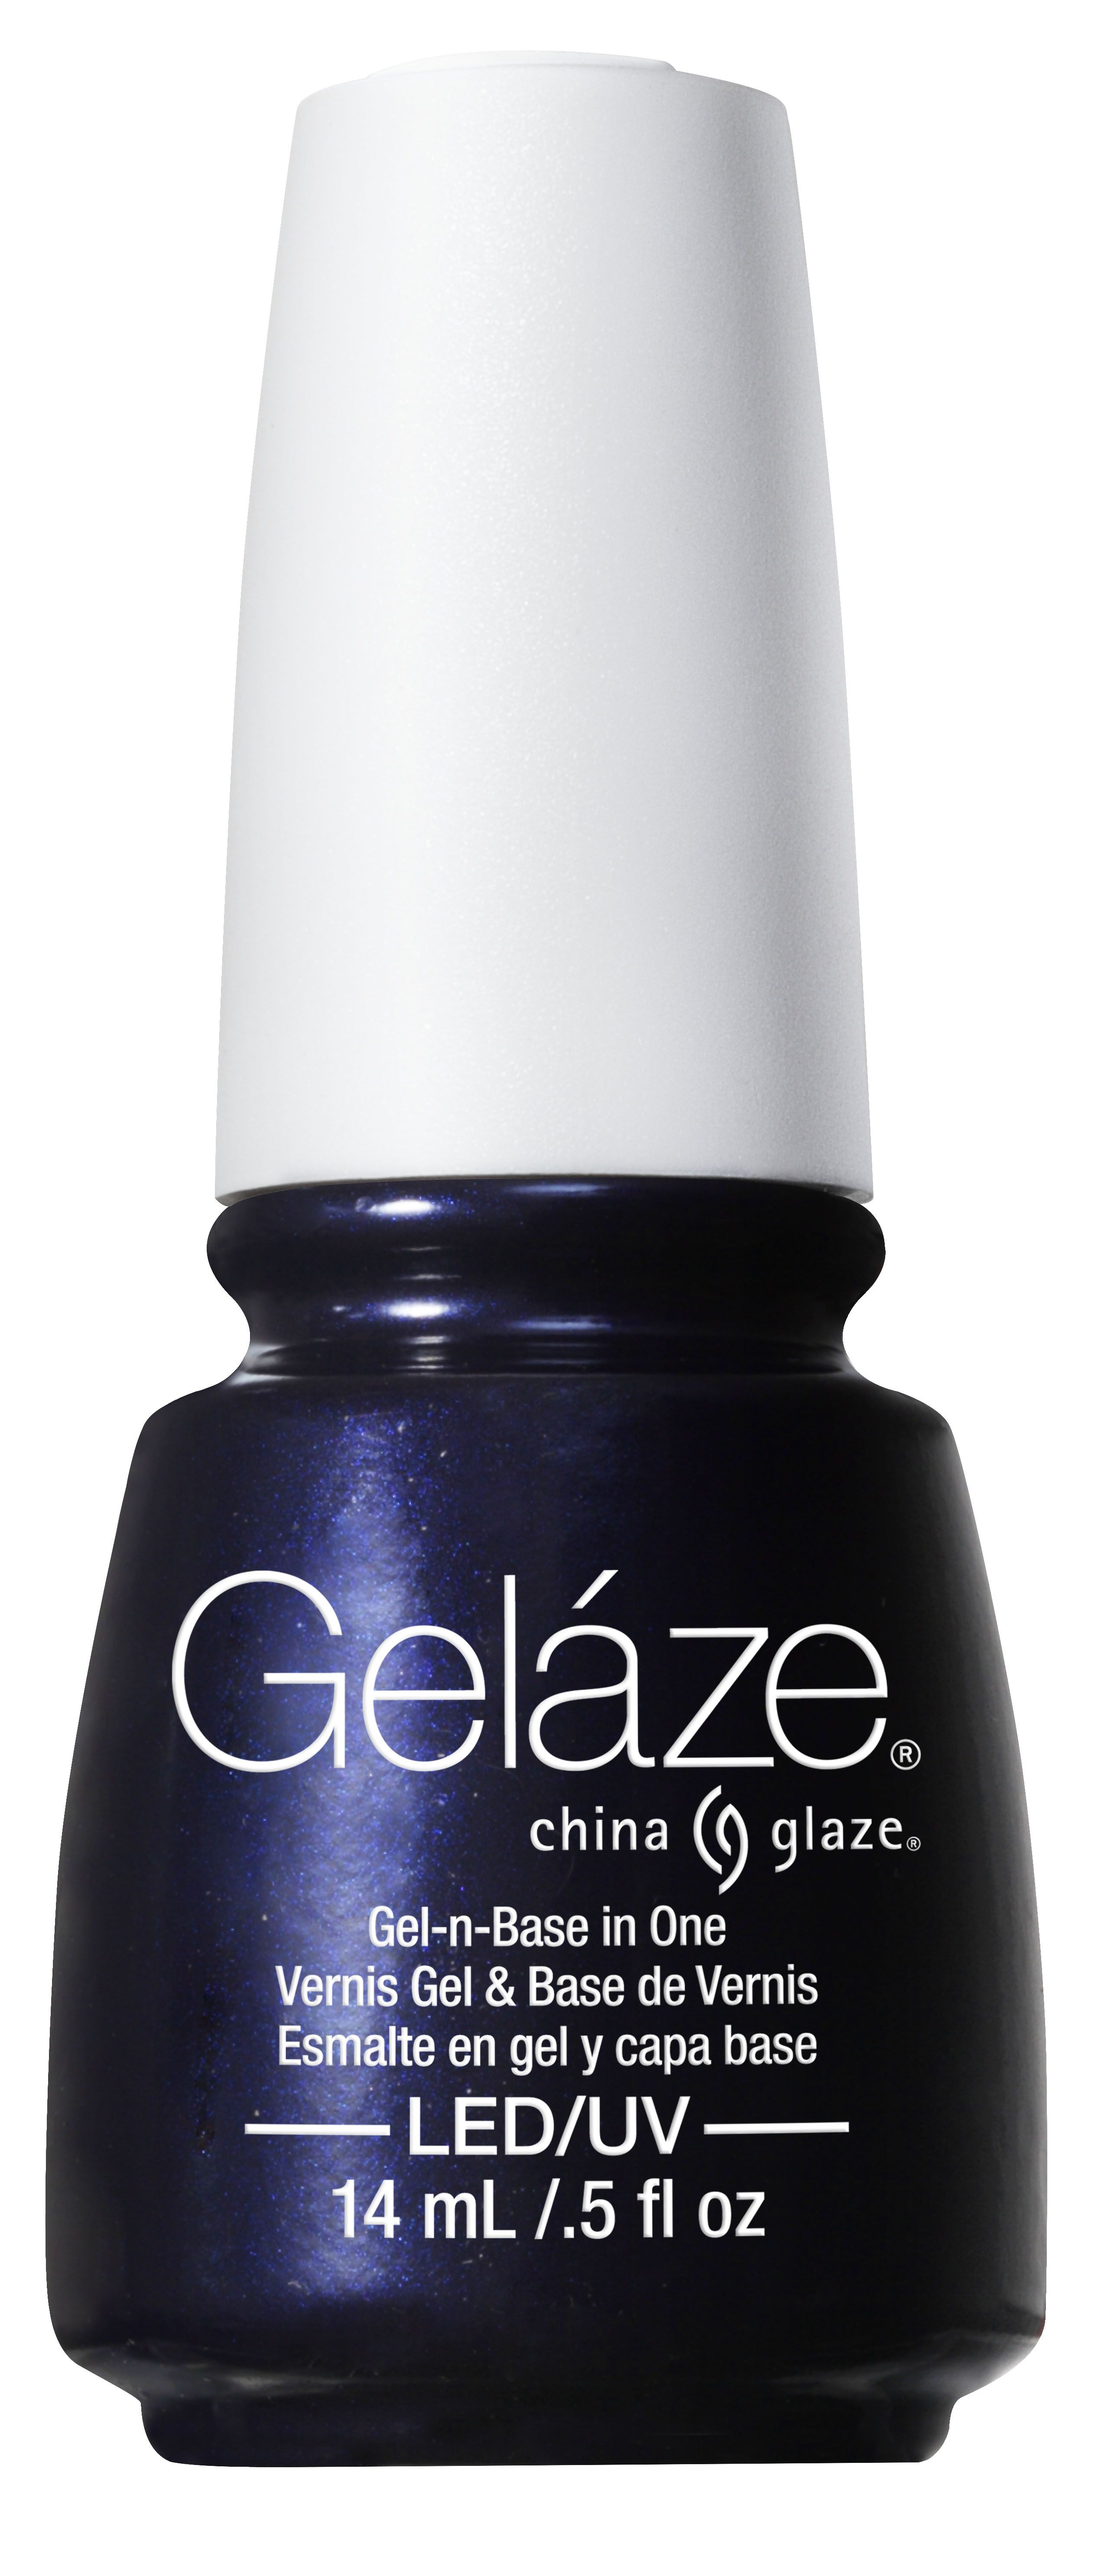 Gelaze Up All Night Gel shellac nails, Sally beauty